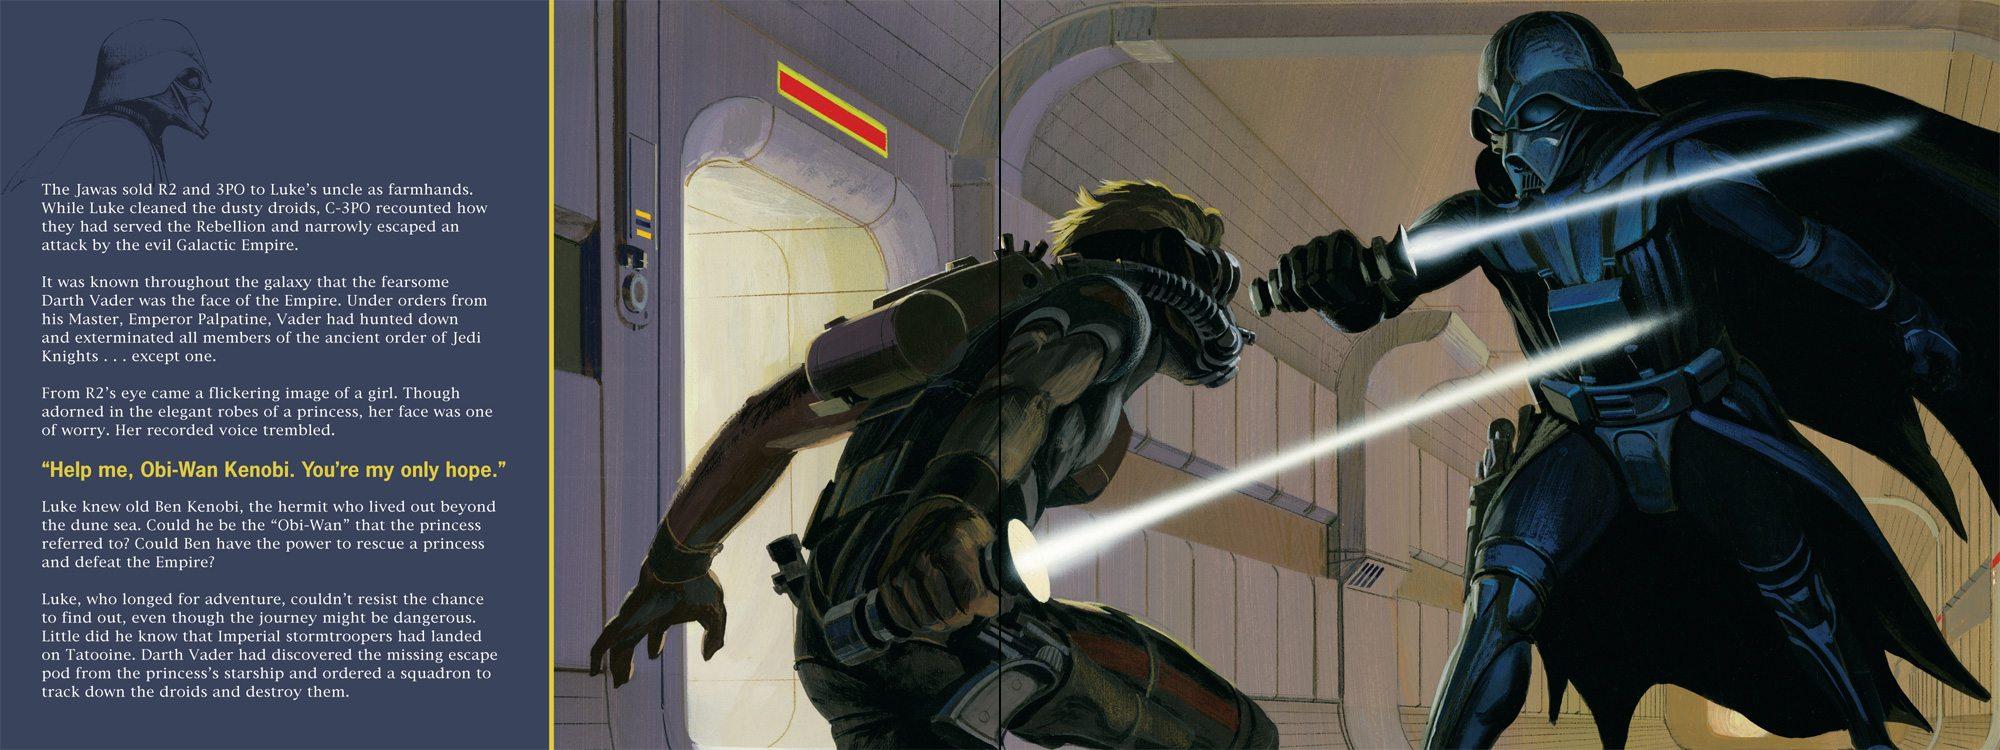 Darth Vader by Ralph McQuarrie